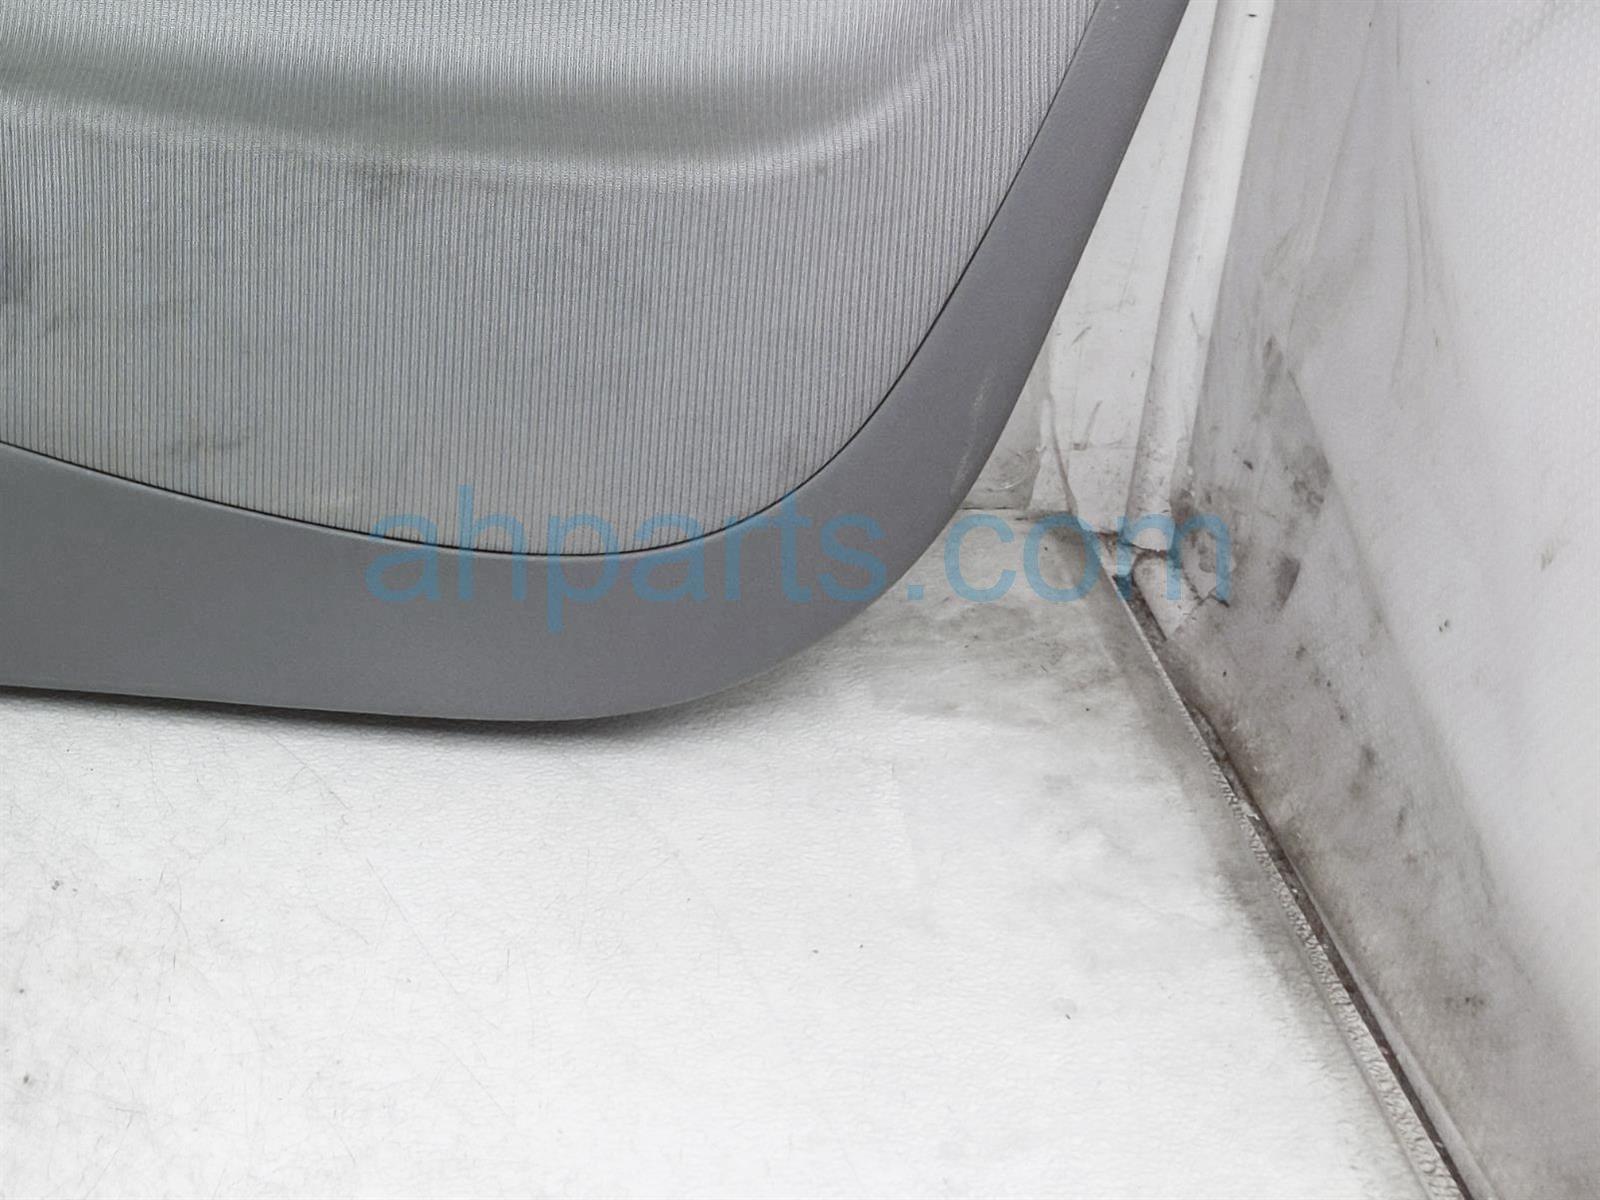 2003 Honda Insight Front Trim / Liner 2dr Passenger Interior Door Panel   Grey 83500 S3Y A02ZA Replacement